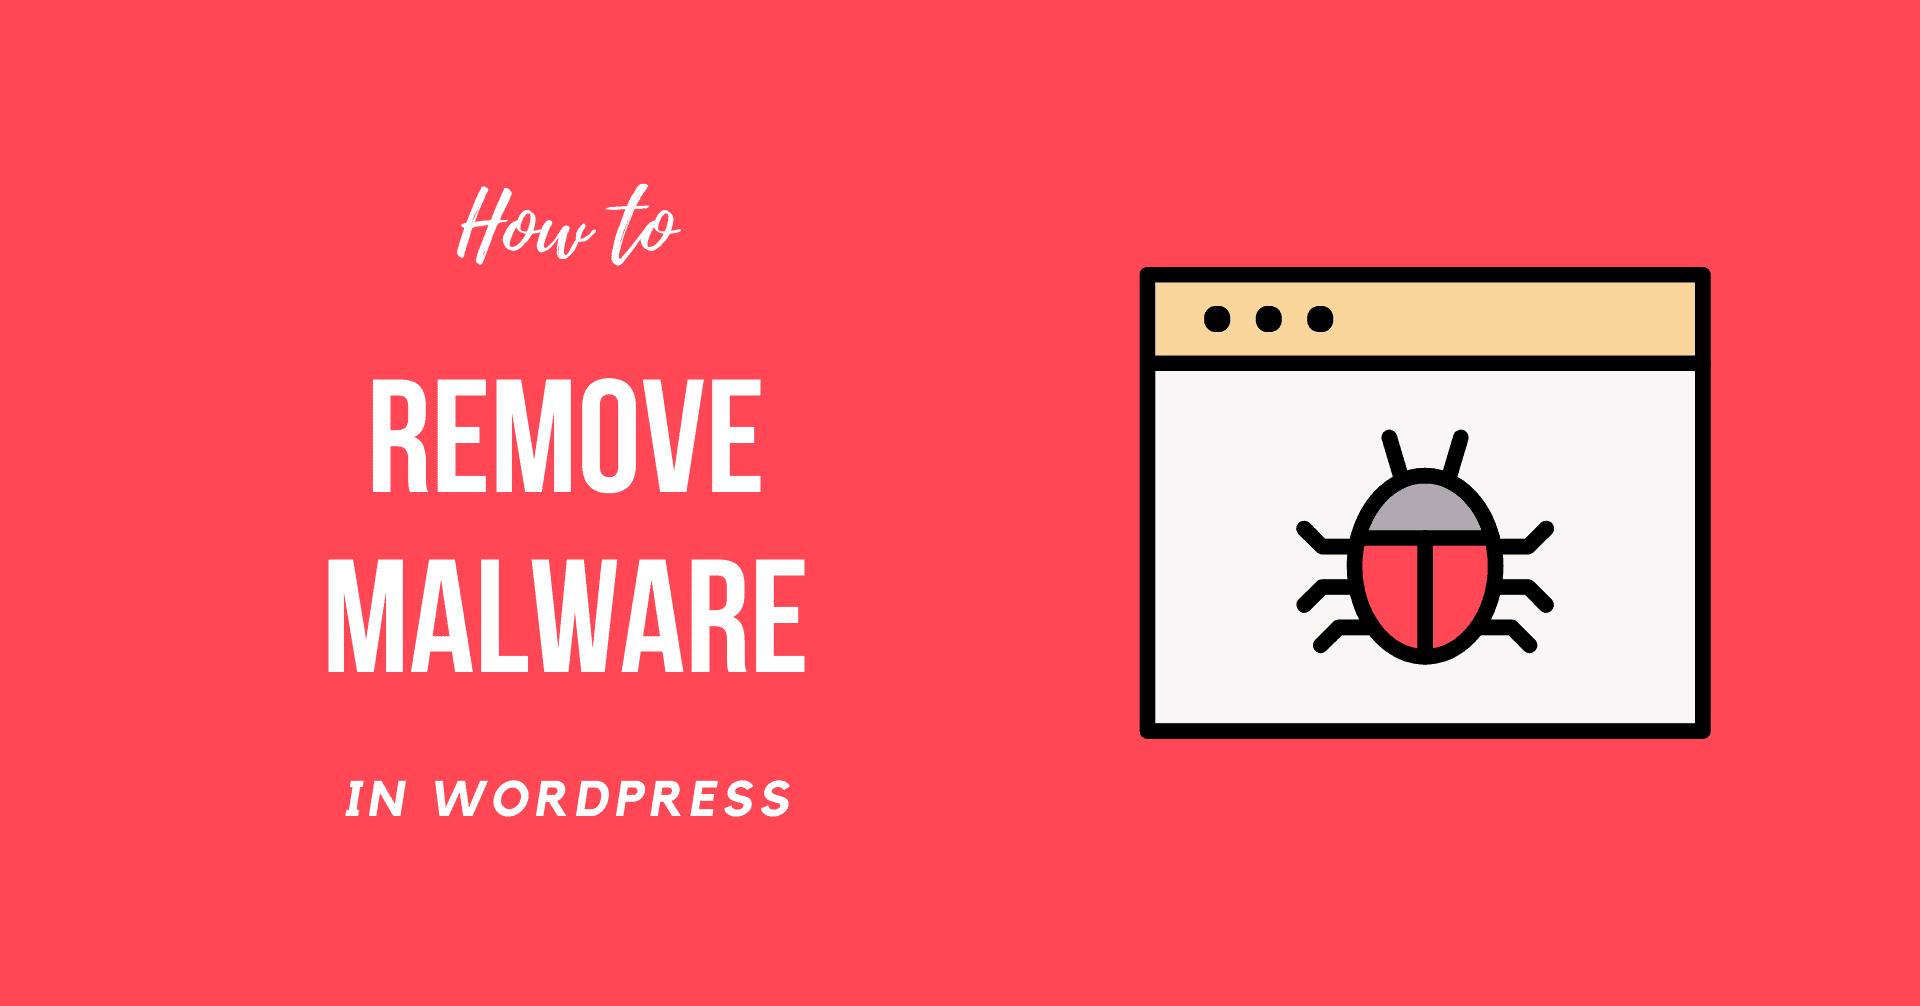 Easy Steps for WordPress Malware Removal